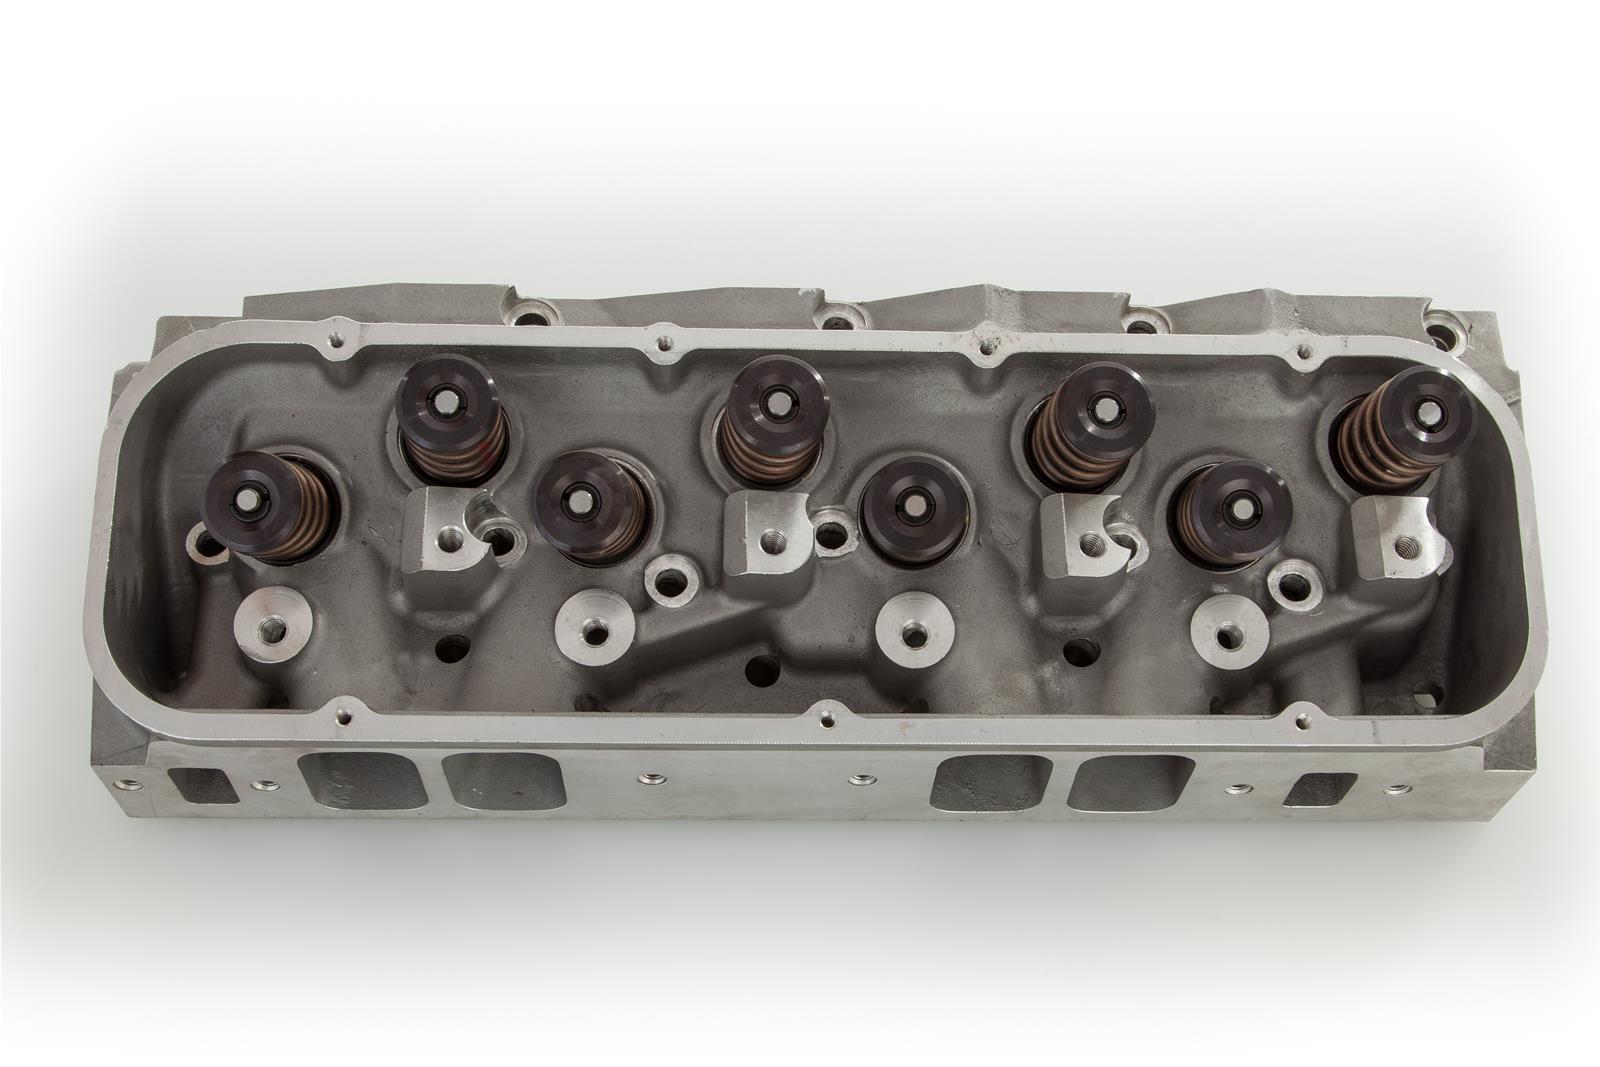 FLOTEK 320cc Big Block Chevy Cylinder Heads 305-6056